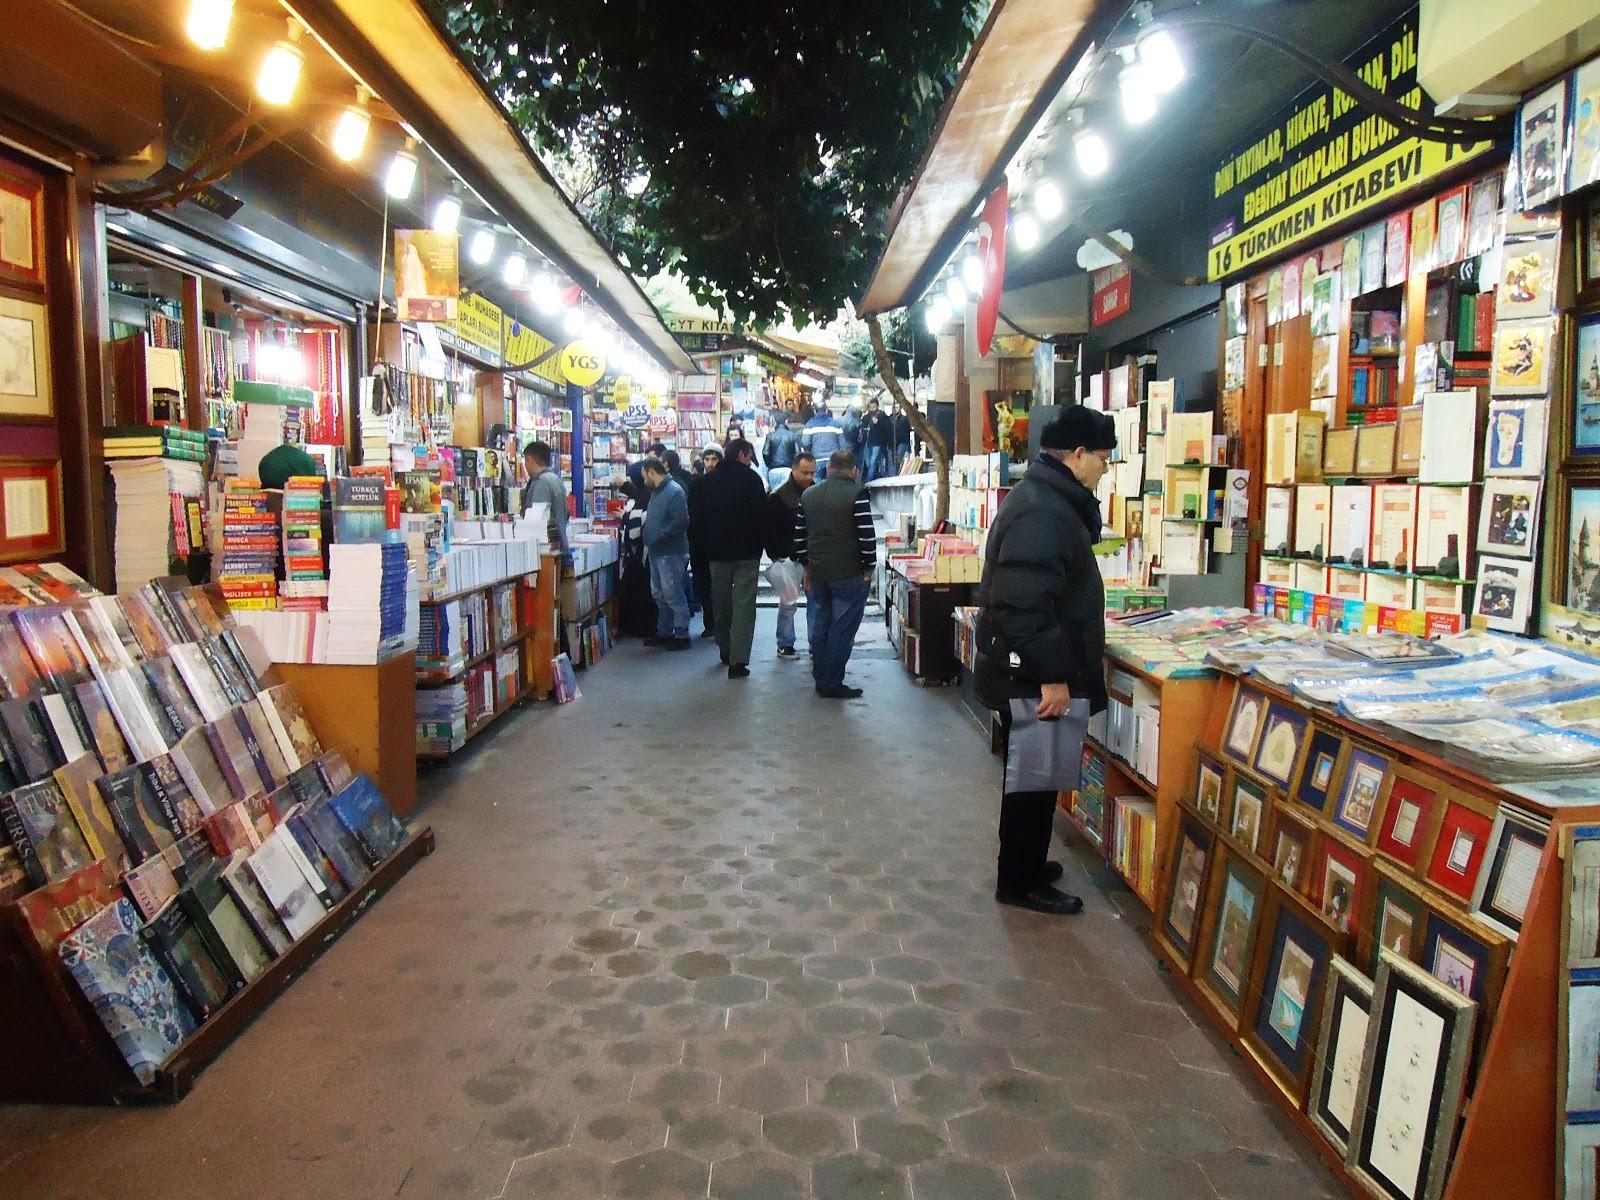 57e863dee8 Ένα από τα πιο μικρά παζάρια της Κωνσταντινούπολης είναι το Arasta και  βρίσκεται κοντά στο τζαμί Sultan Ahmed. Φημίζεται για τα λαμπερά του  κοσμήματα